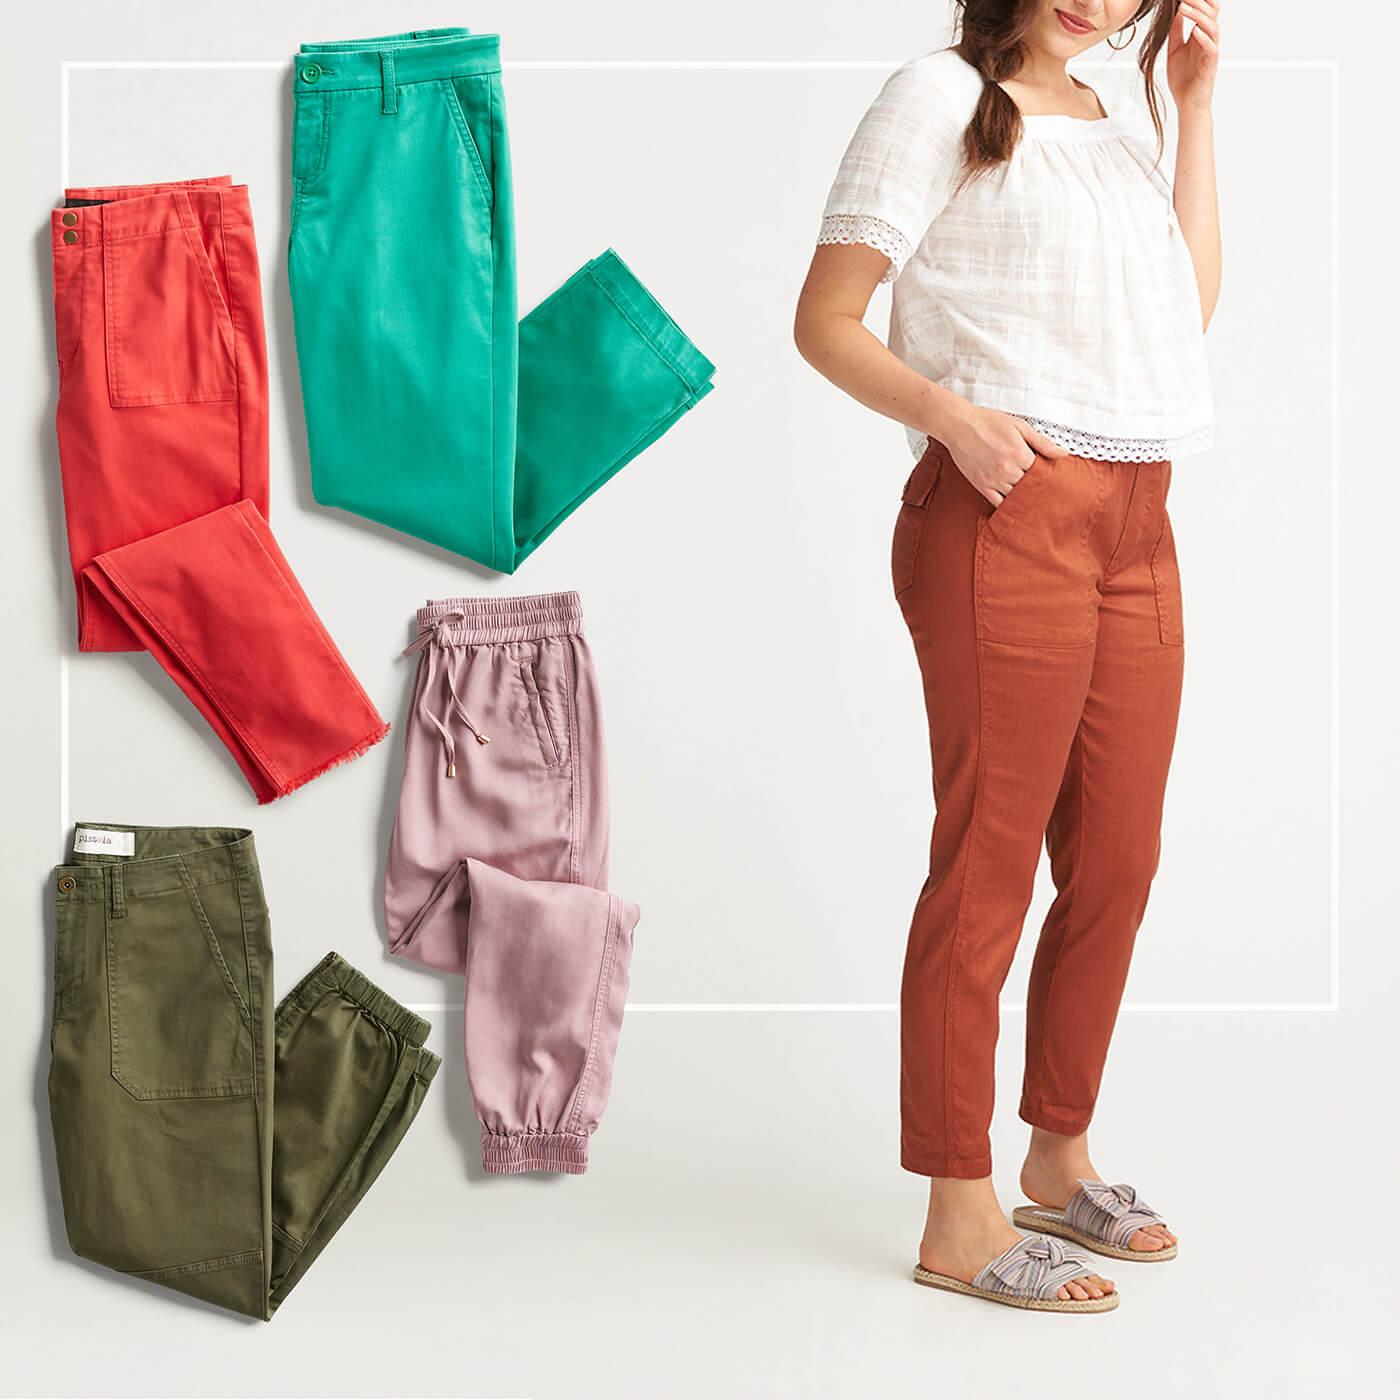 Alternatives for Shorts